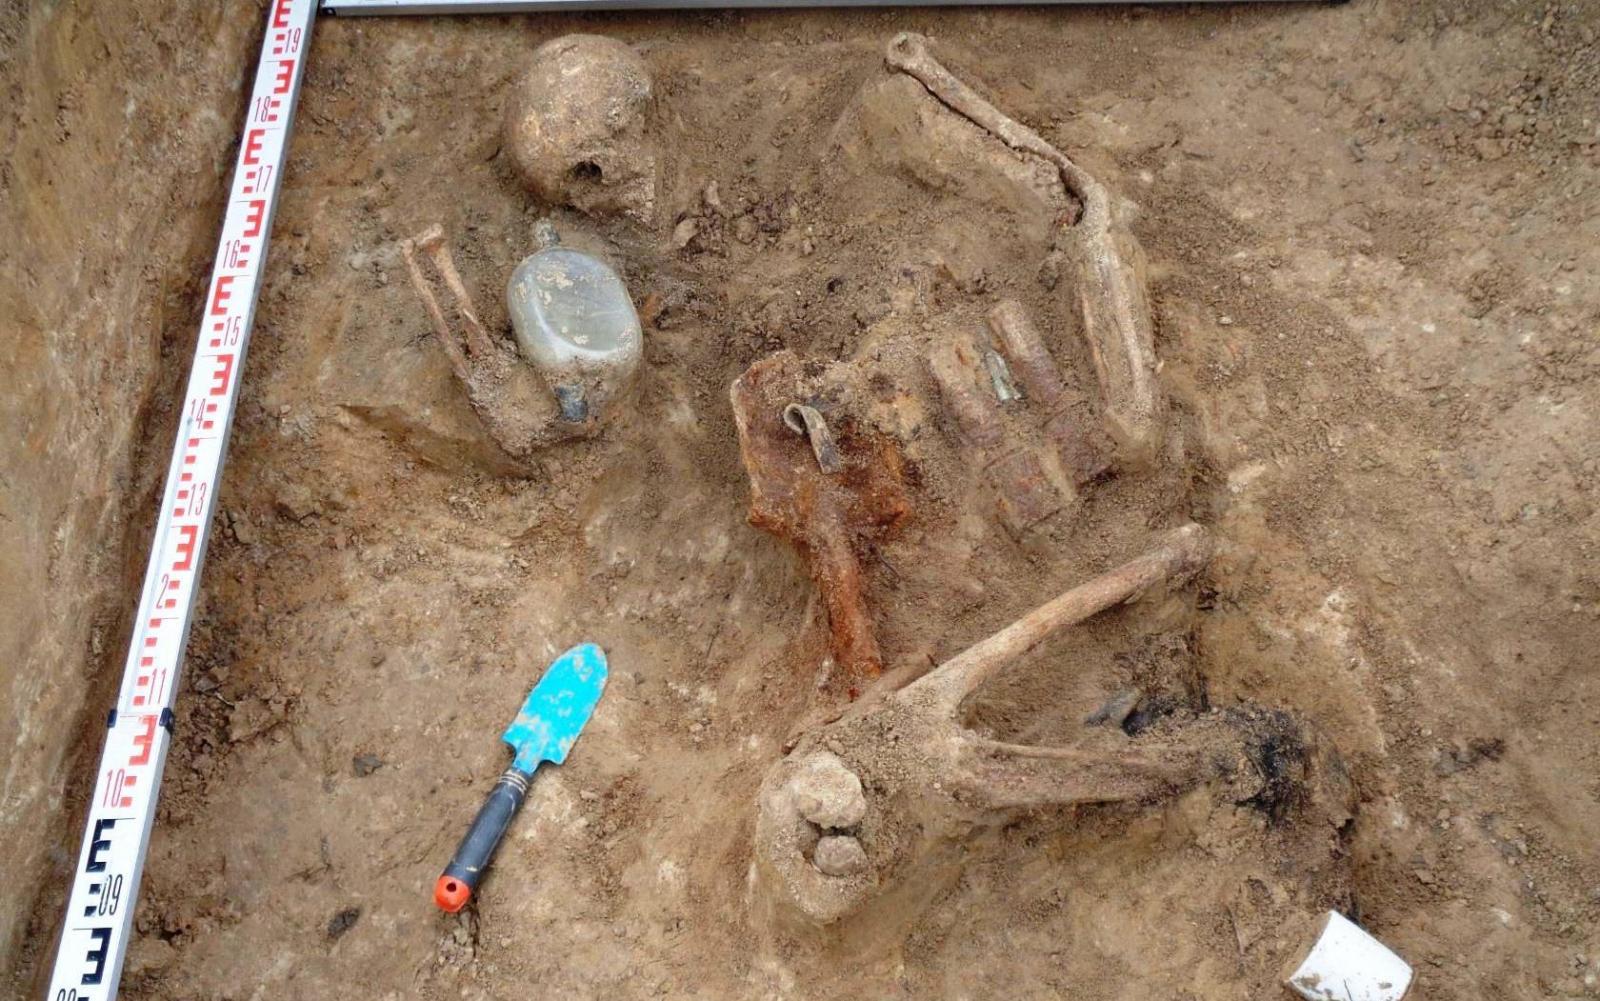 Брянские поисковики нашли останки солдата времен ВОВ